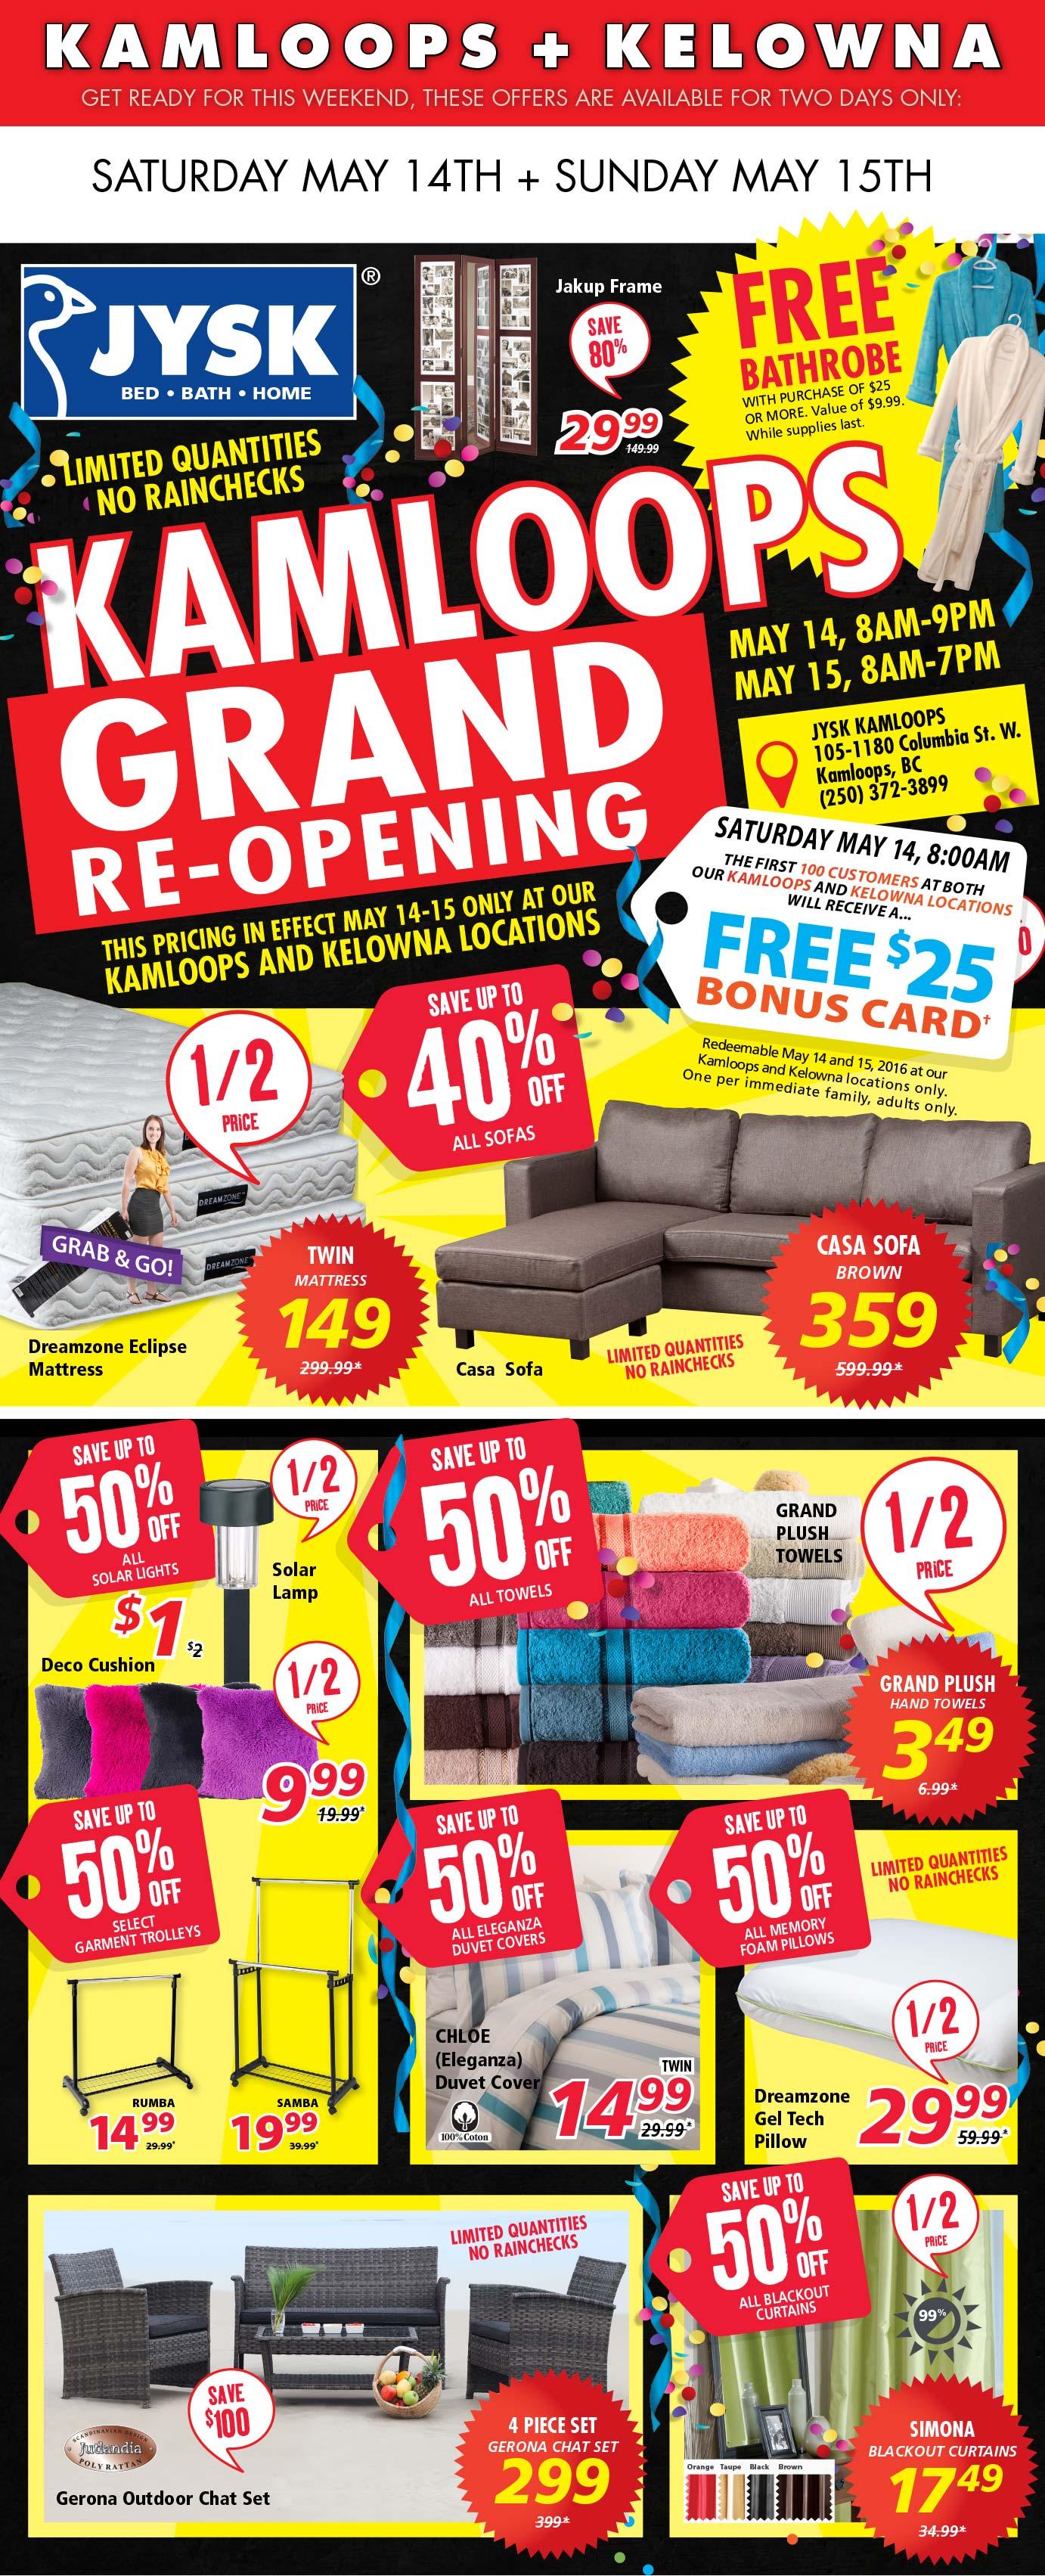 Kamloops Grand ReOpening Event this weekend